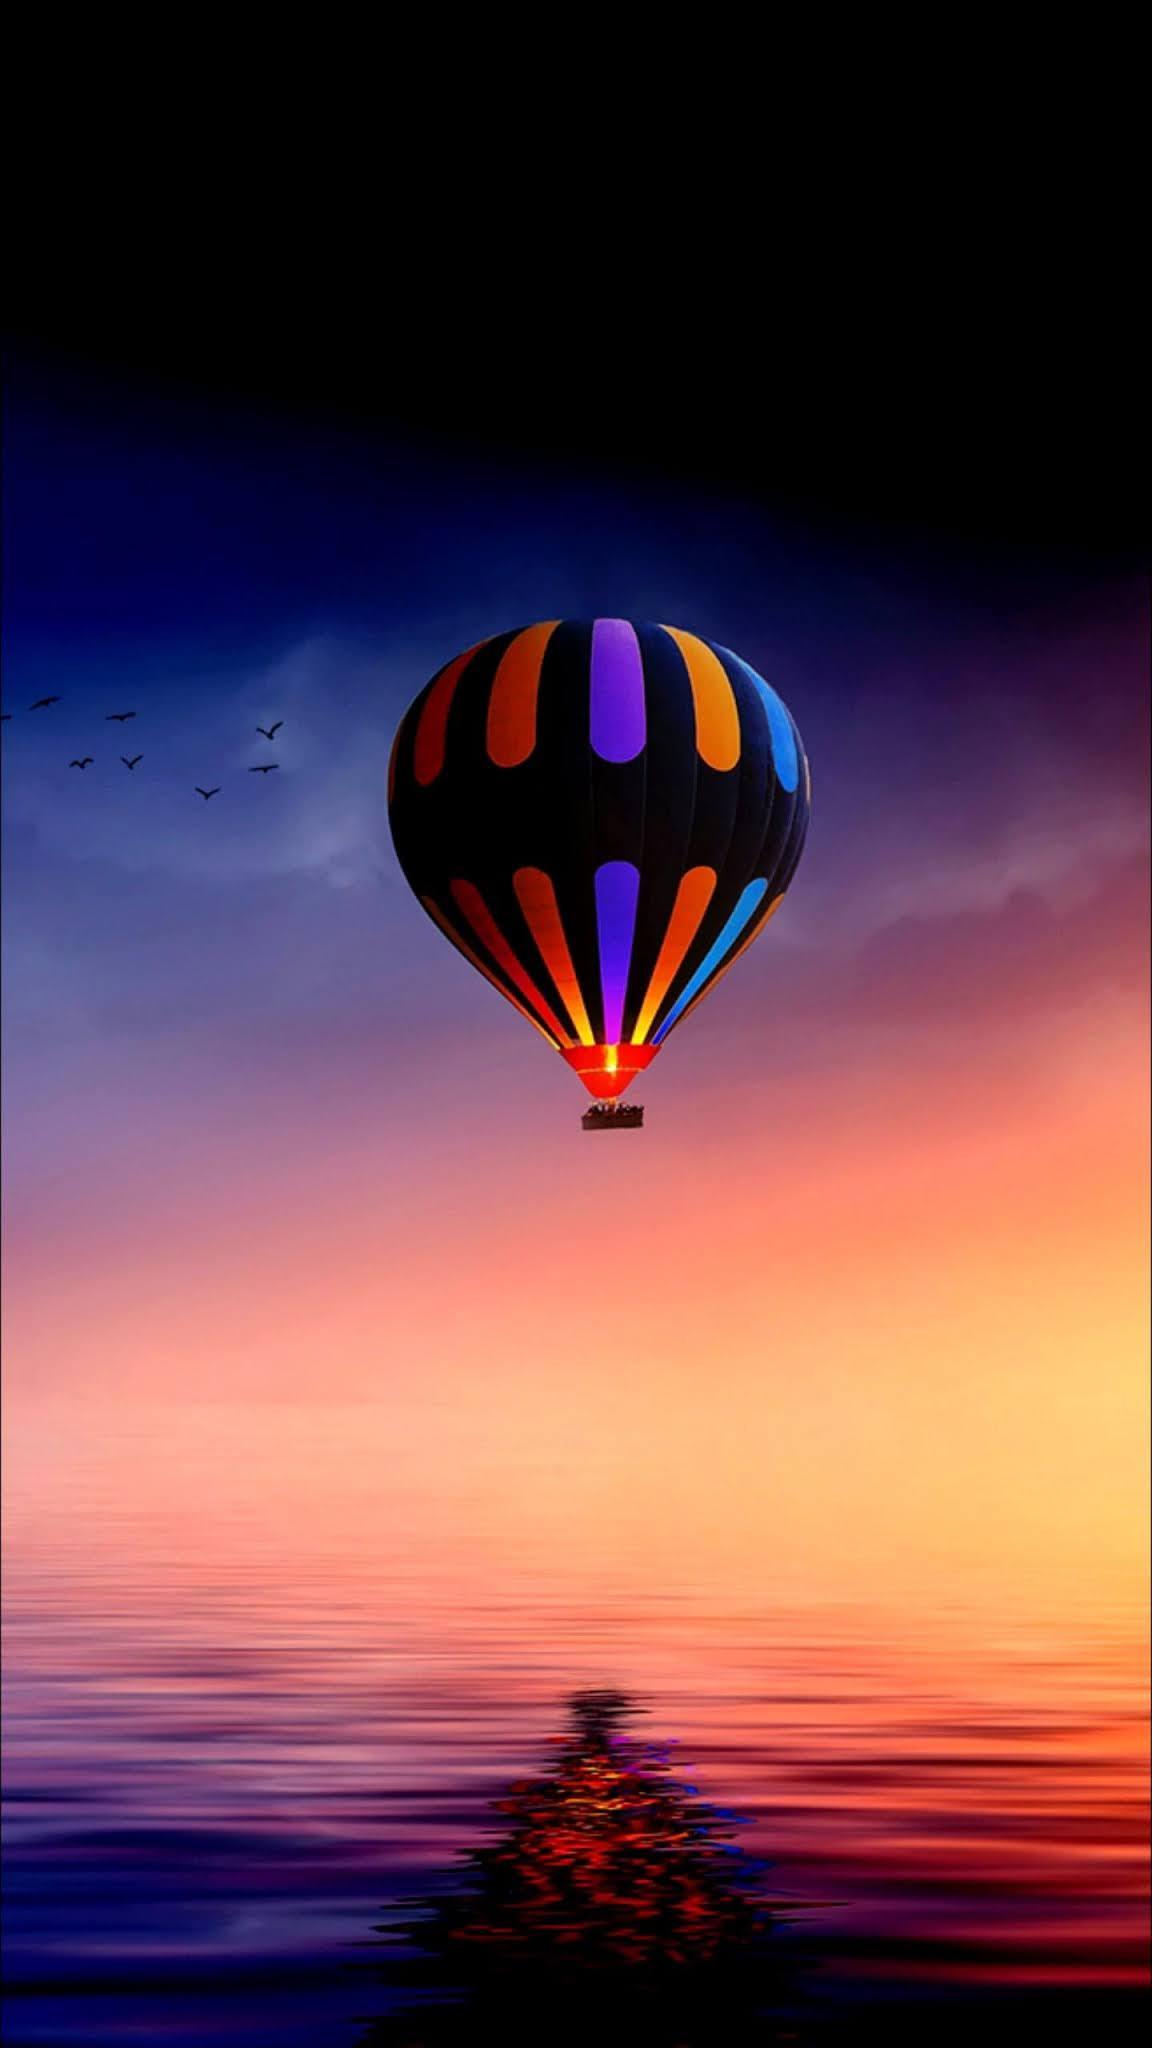 Hot air balloon 4k mobile wallpaper